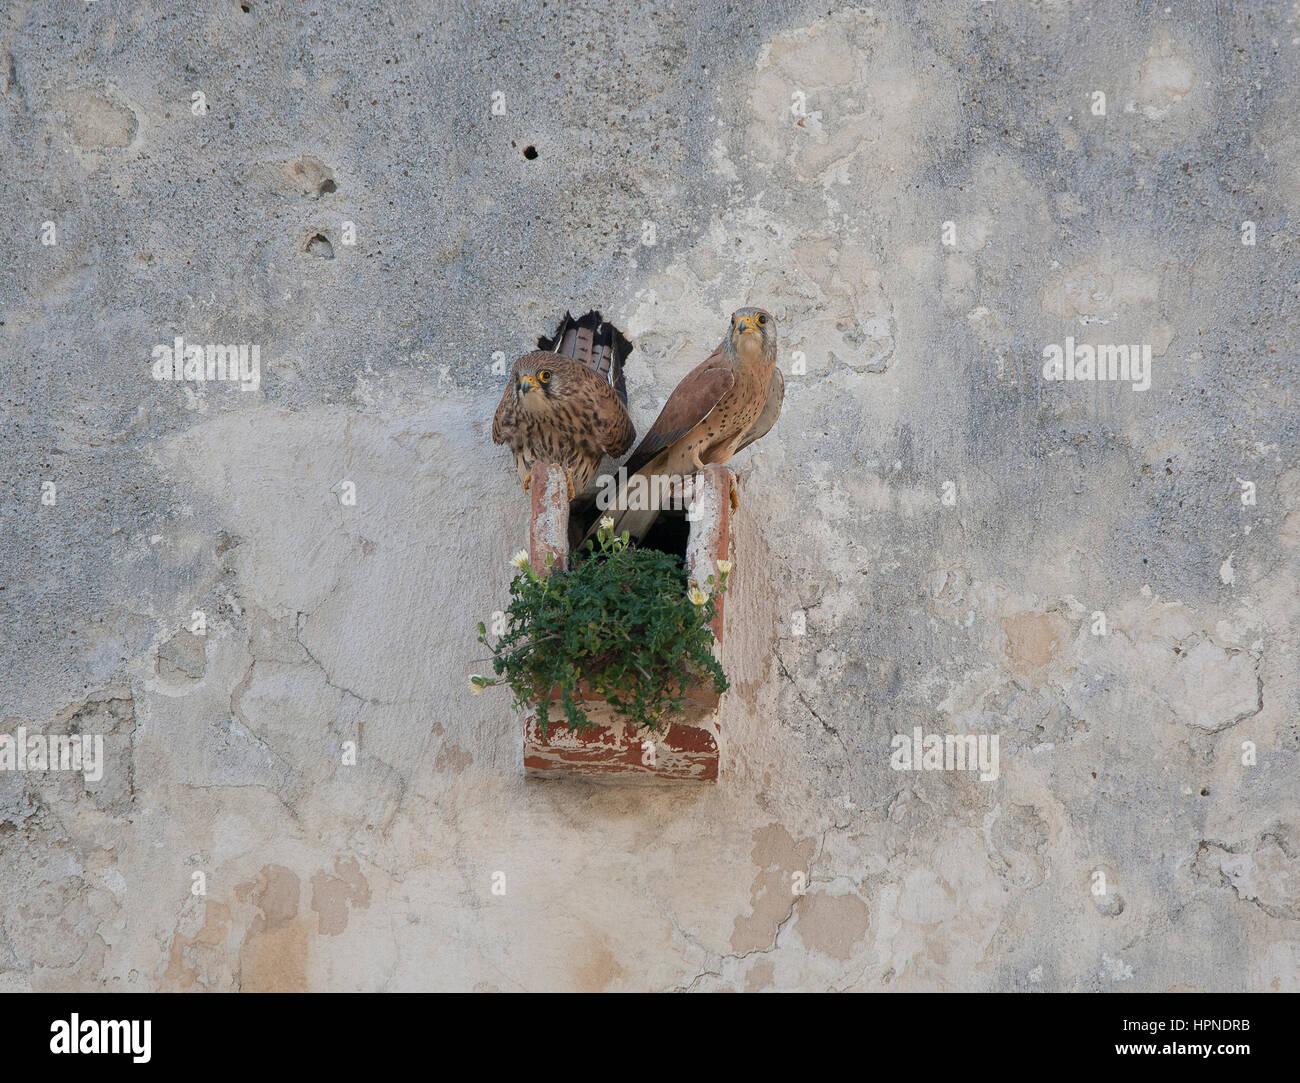 Lesser Kestrels Falco naumanni together at nest site in castle Tarifa Andalucia Spain - Stock Image